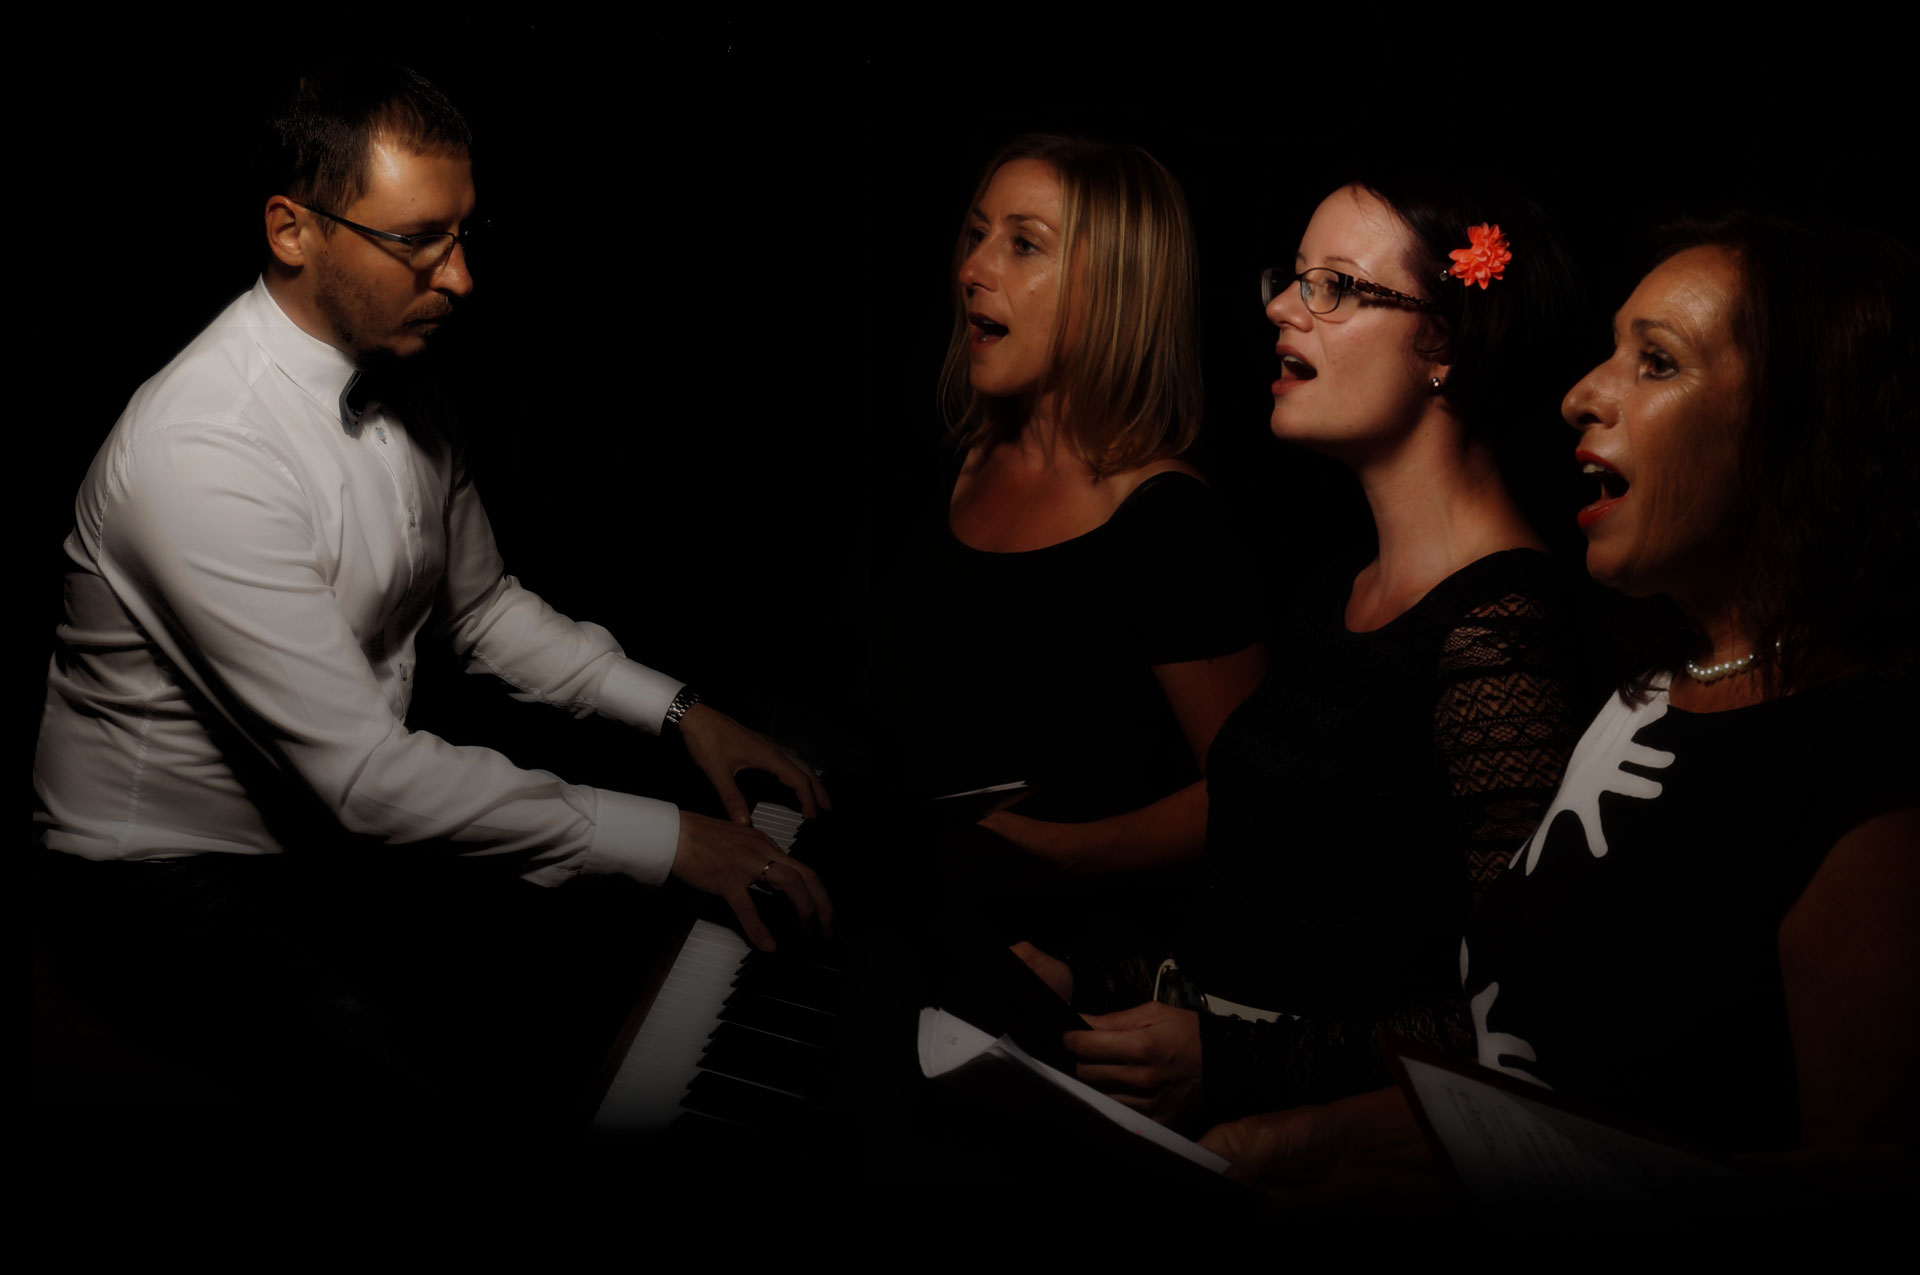 KlippenKlang singender Chor 2